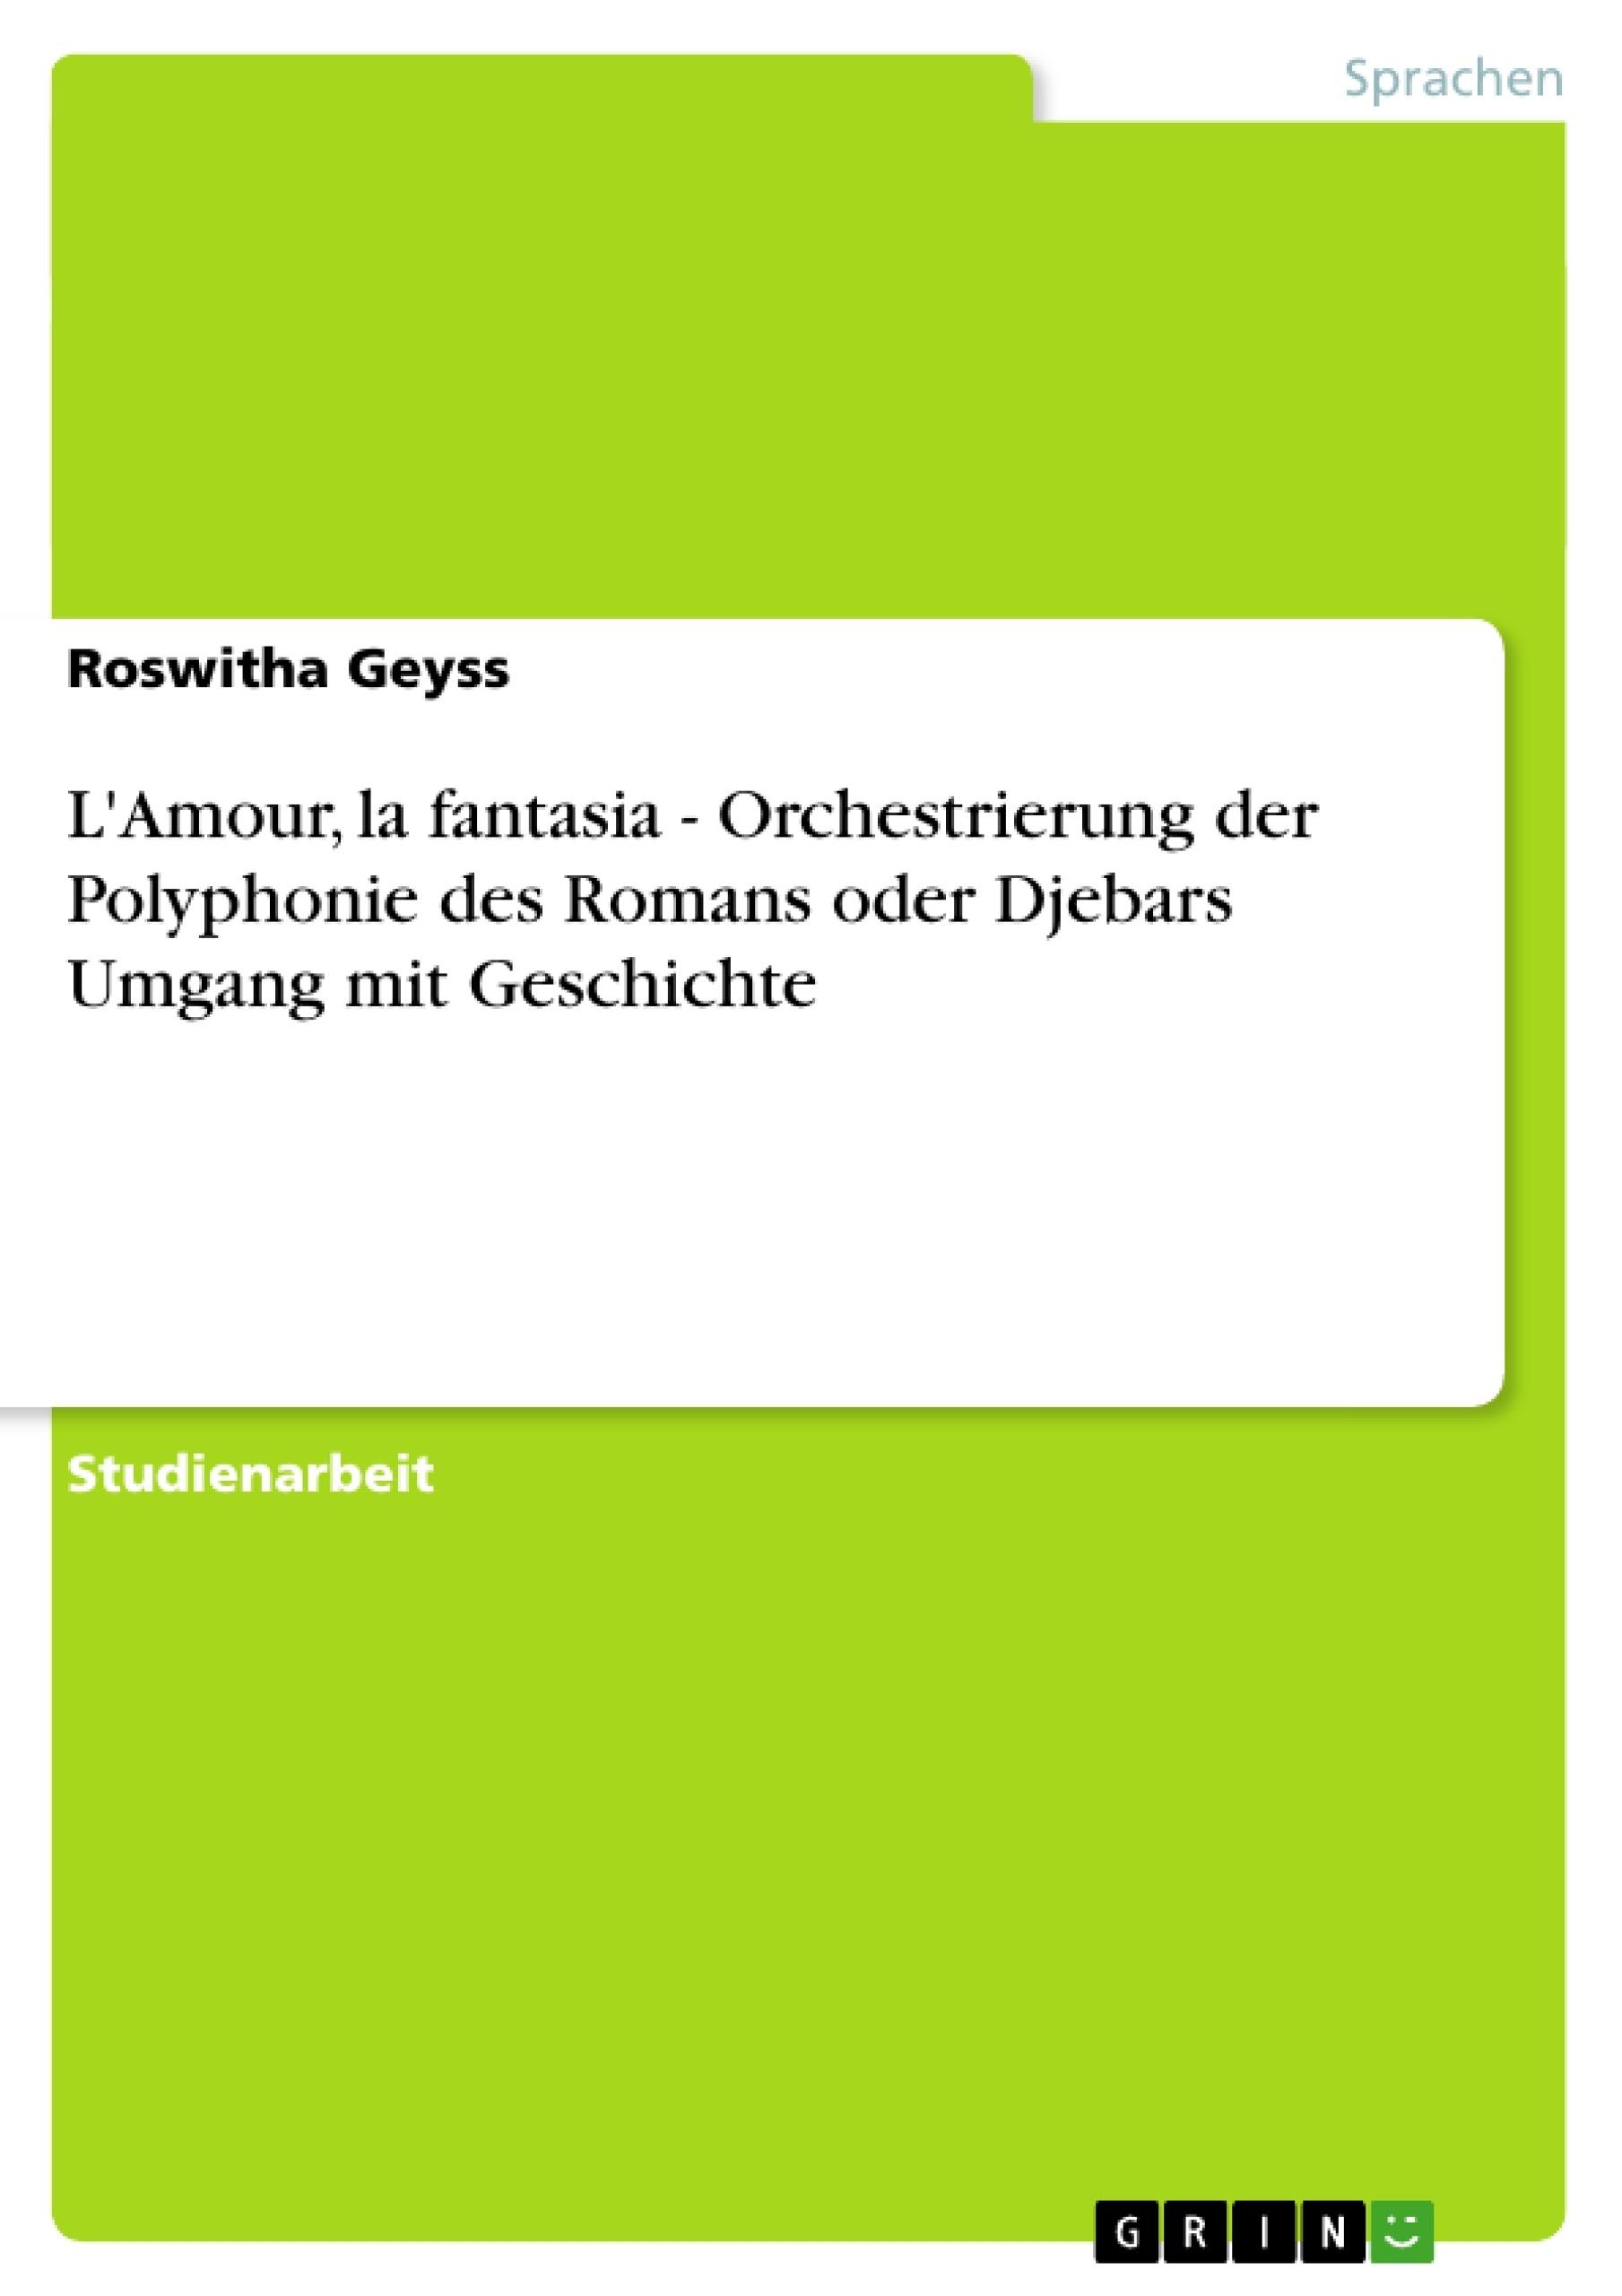 Titel: L'Amour, la fantasia  - Orchestrierung der Polyphonie des Romans oder Djebars Umgang mit Geschichte